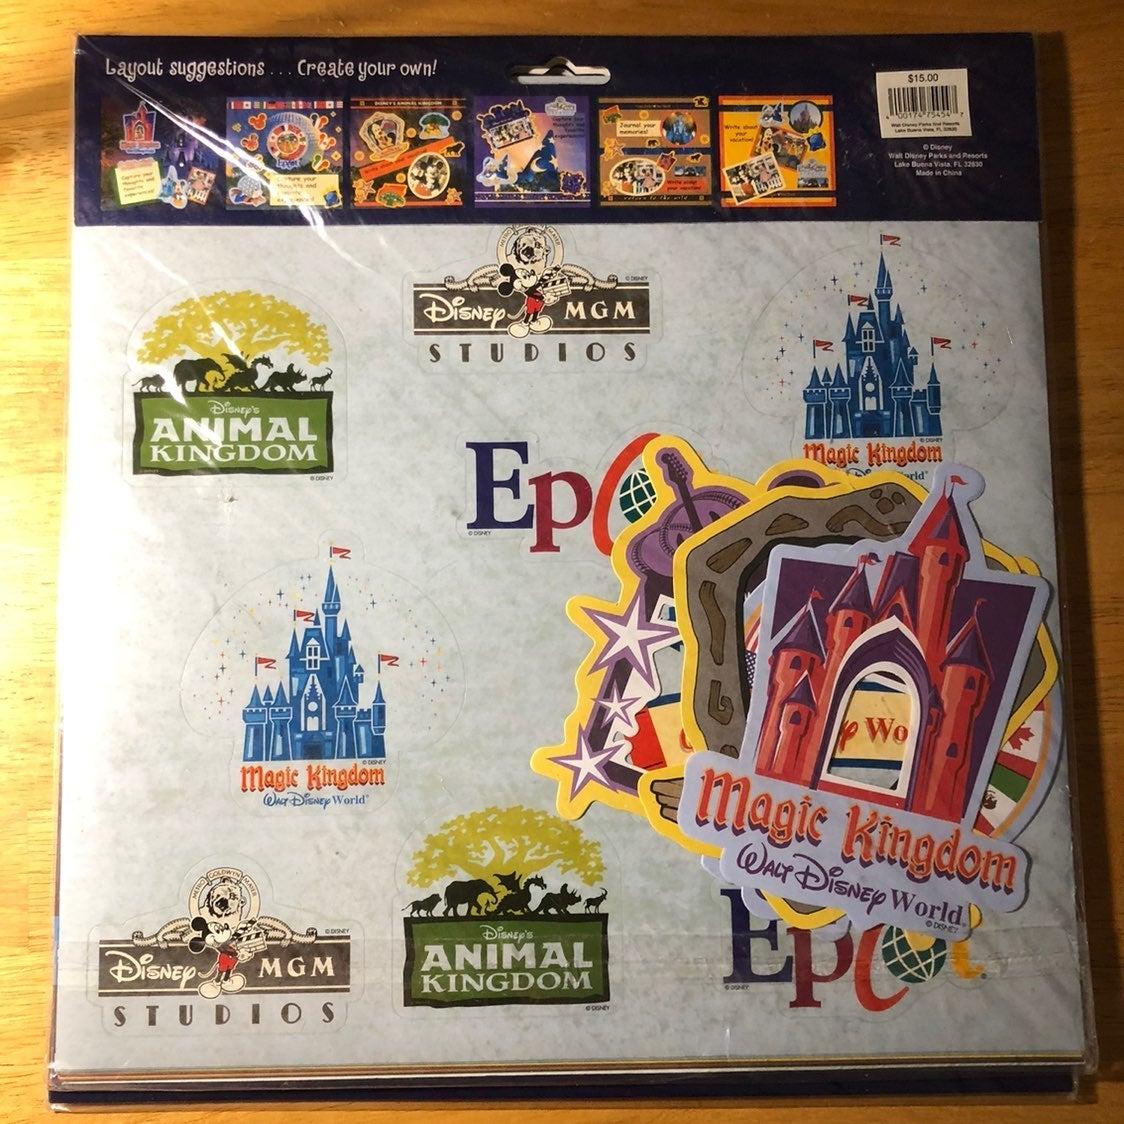 New Walt Disney World scrapbook kit